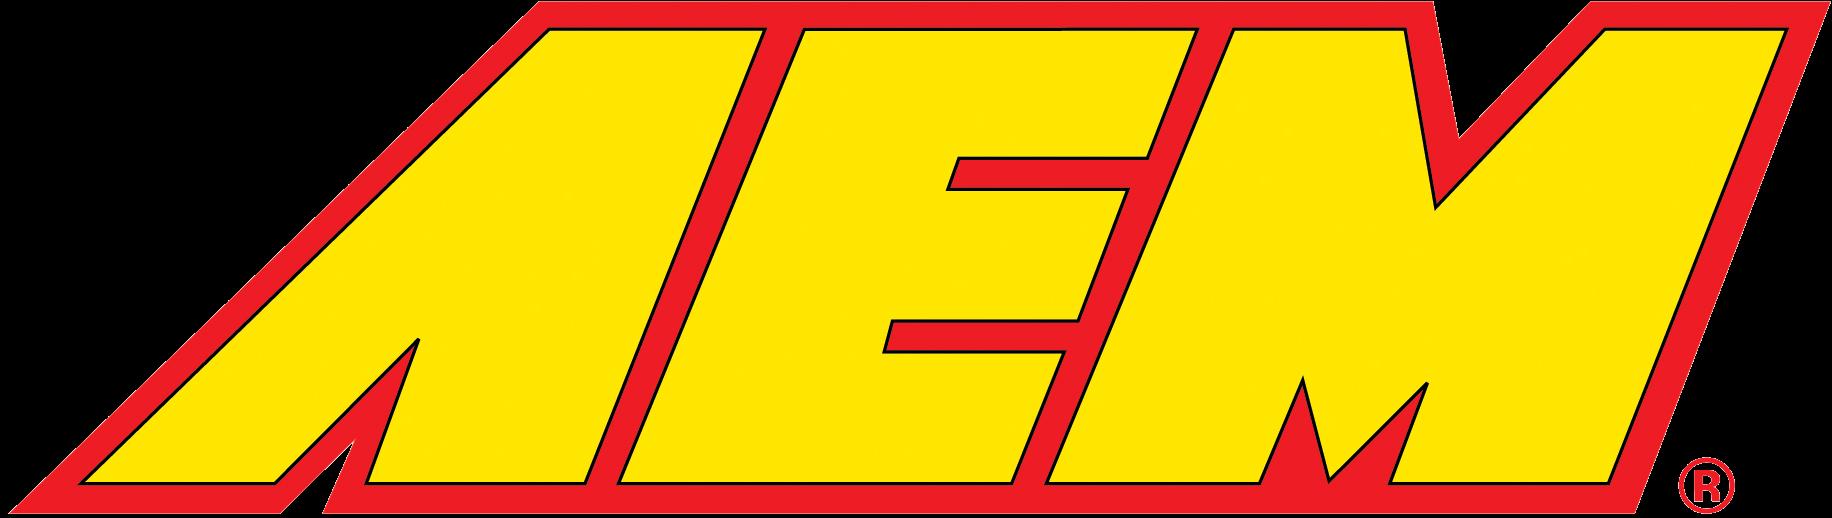 Aem Logo PNG - 114021